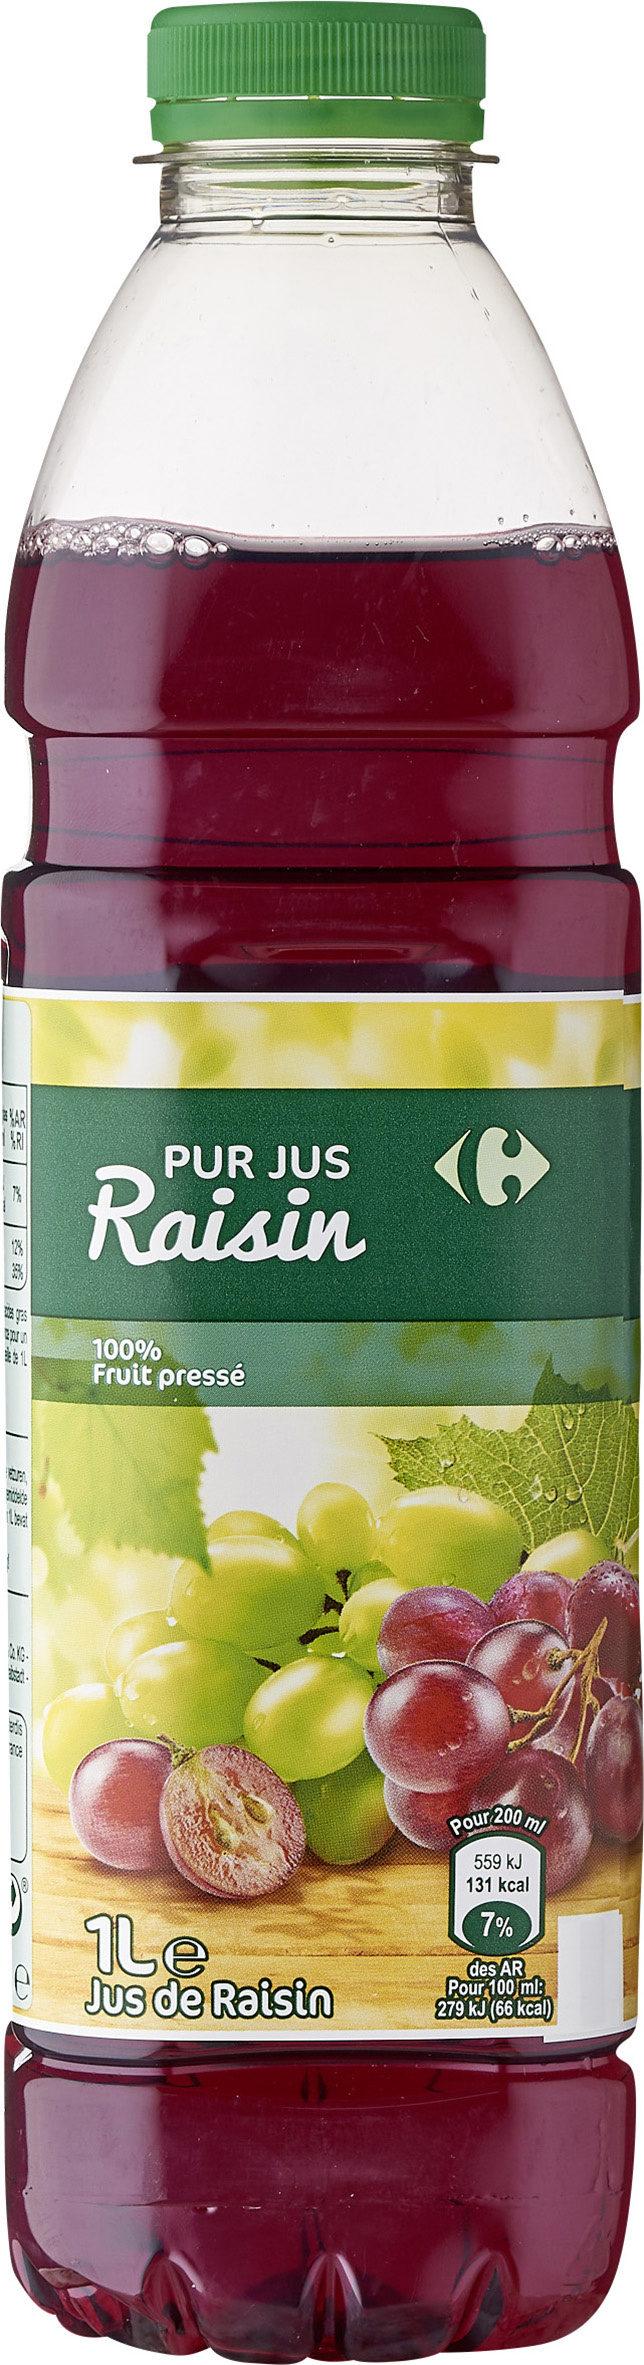 PUR JUS Raisin - Produit - fr